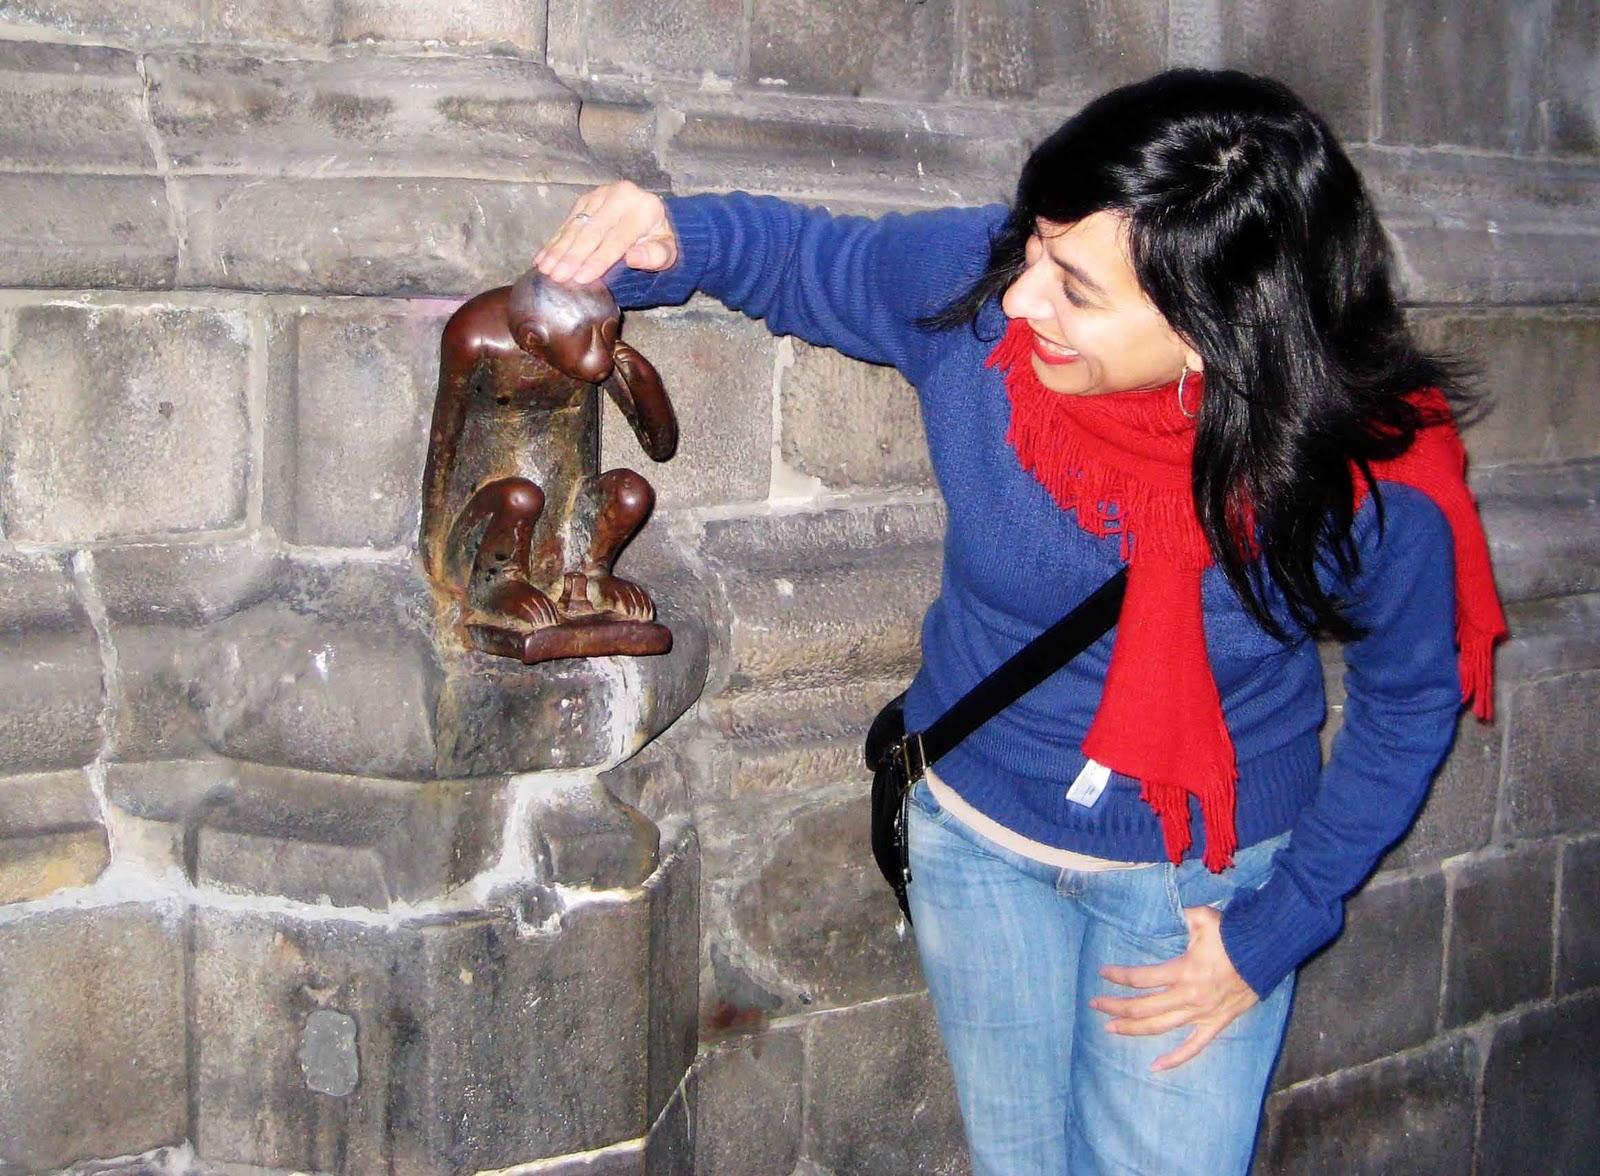 Para atraer la suerte toca la escultura del mono mons - Atraer la suerte ...